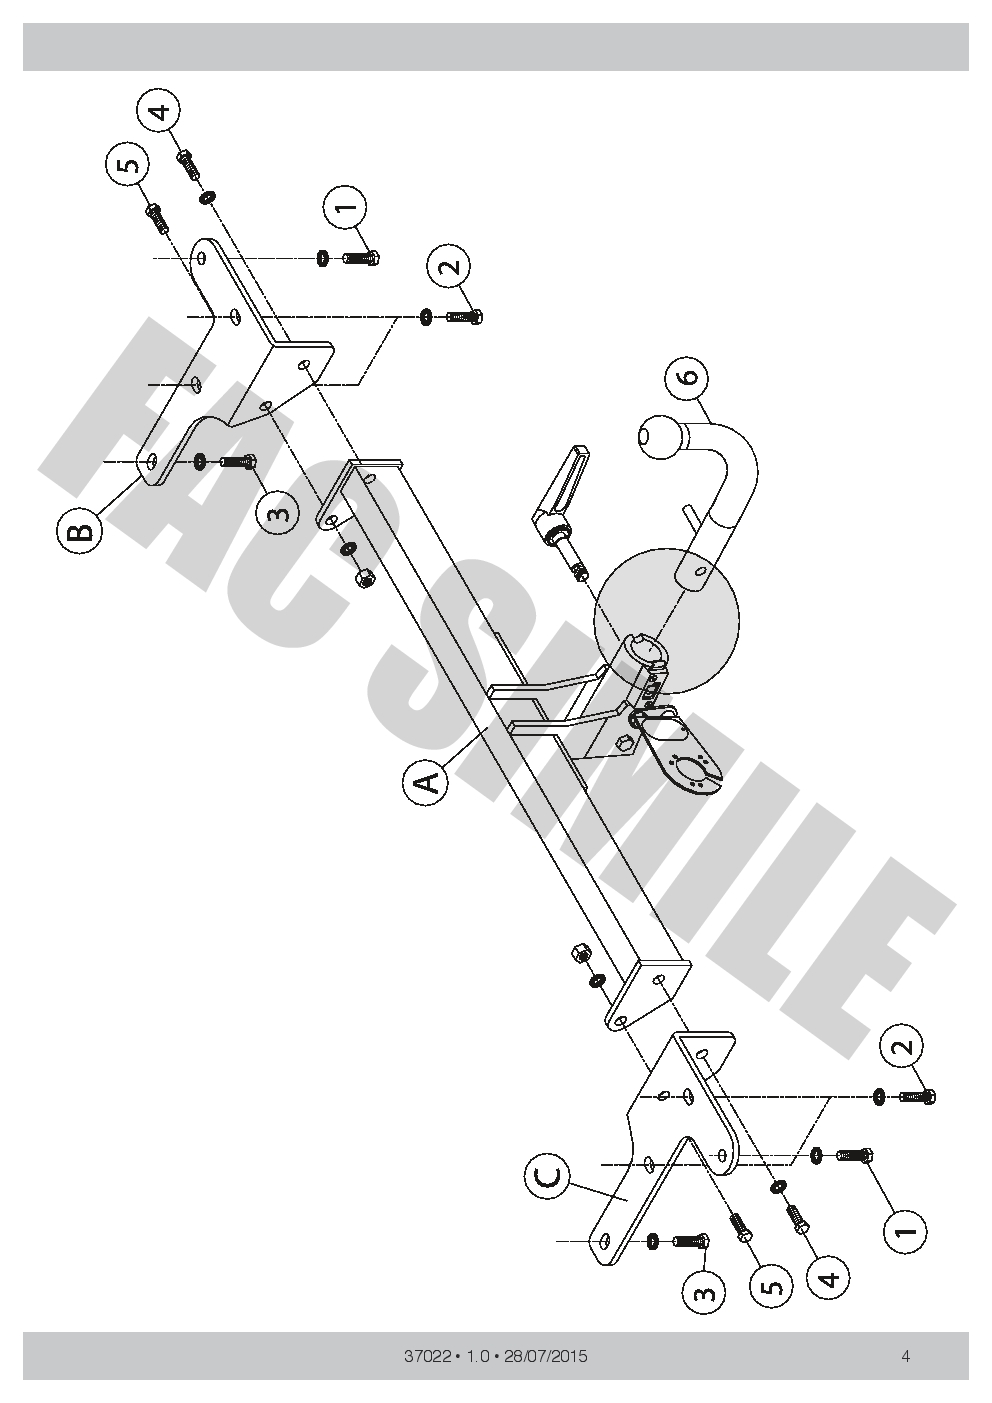 Detachable Towbar 7 Pin Wiring Kit Bypass Relay Tow Bar For Suzuki Diagram Daihatsu Grand Max